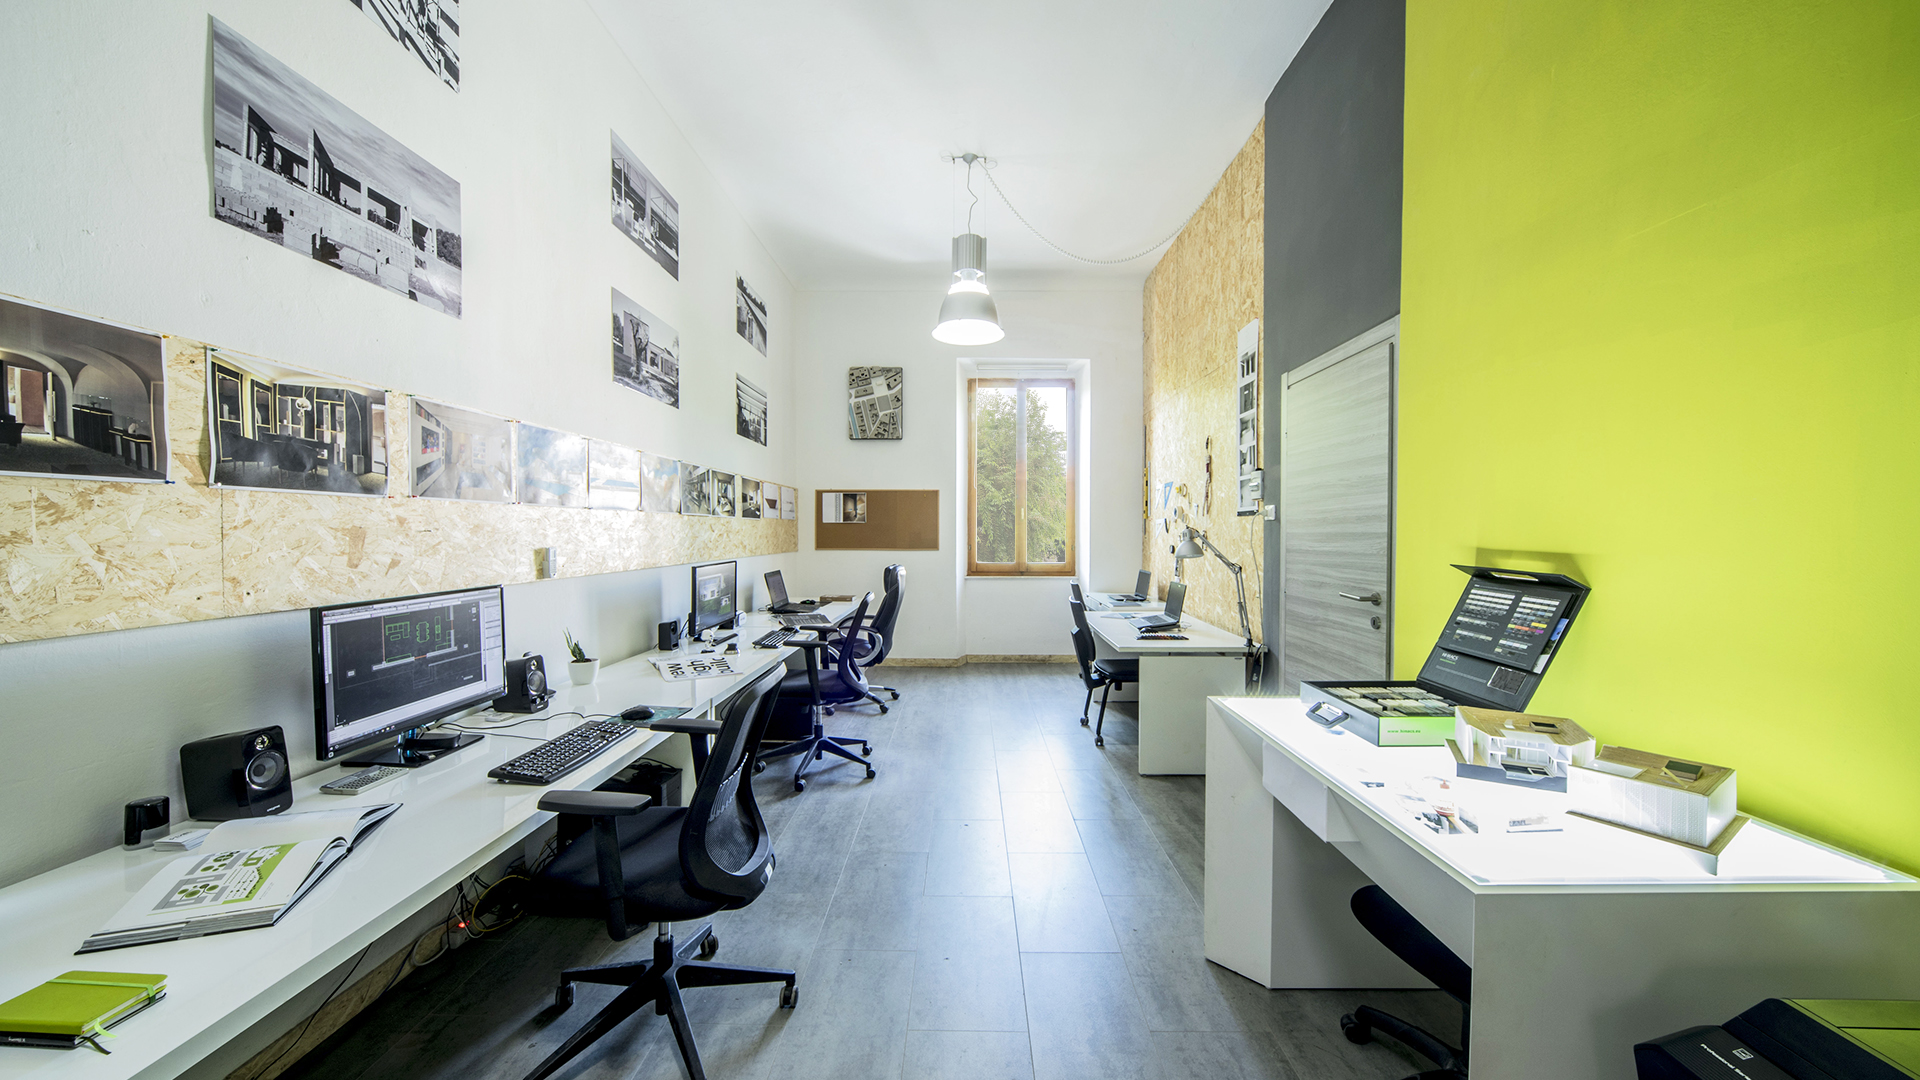 Studio architettura alghero Pixel (10)